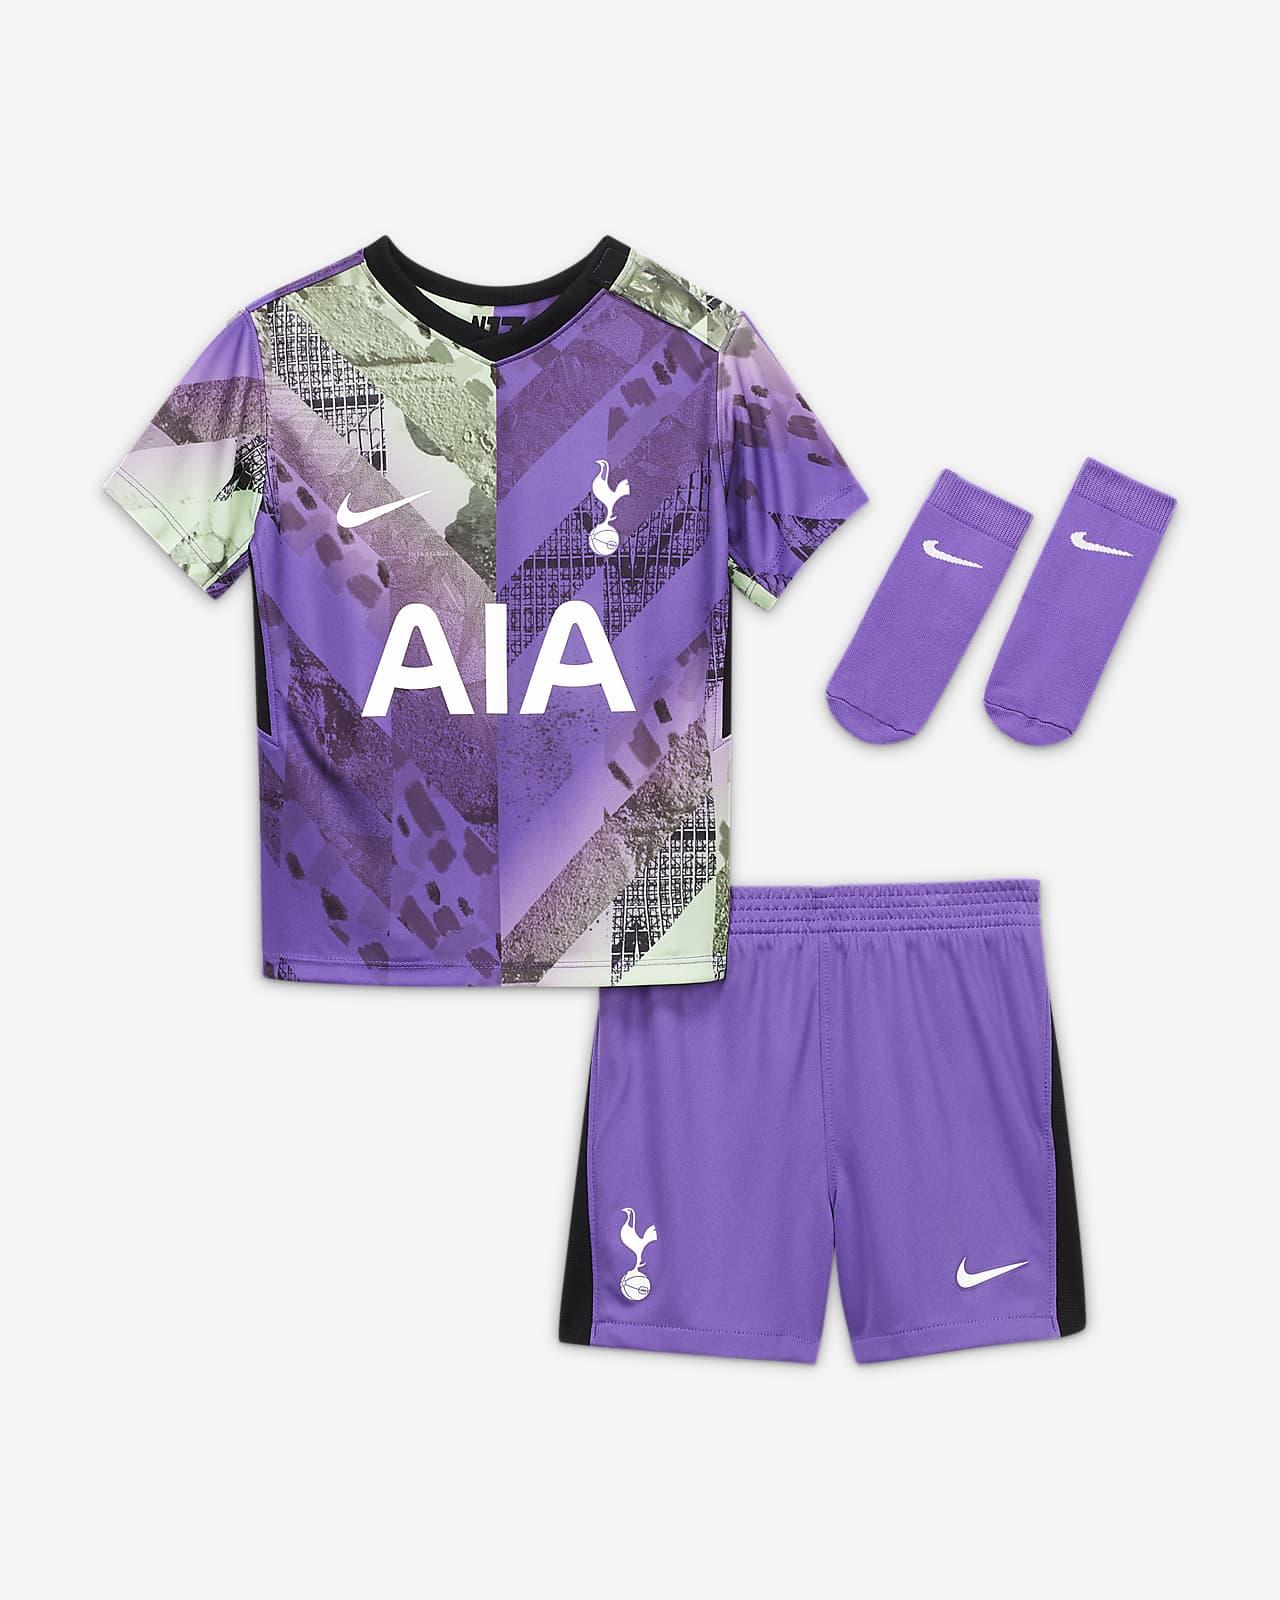 Tottenham Hotspur 2021/22 Third Baby/Toddler Kit